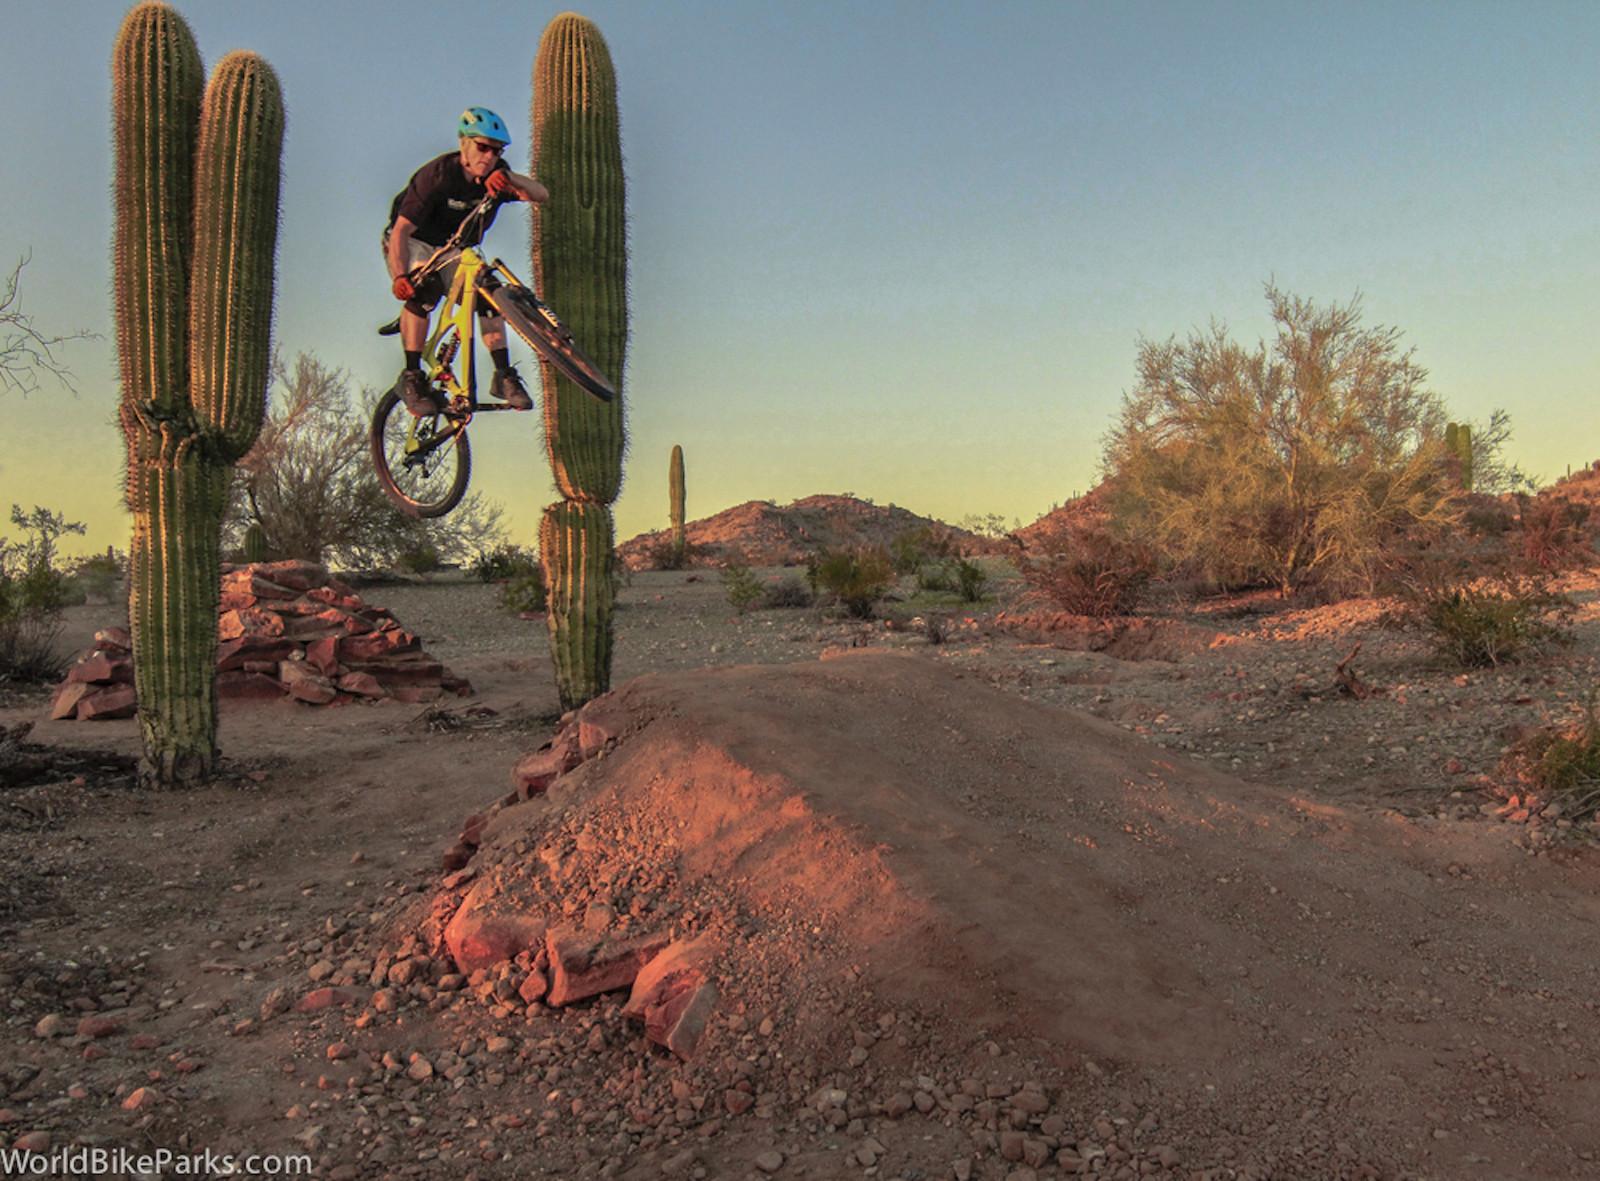 IMG 3285 - TreyClay - Mountain Biking Pictures - Vital MTB